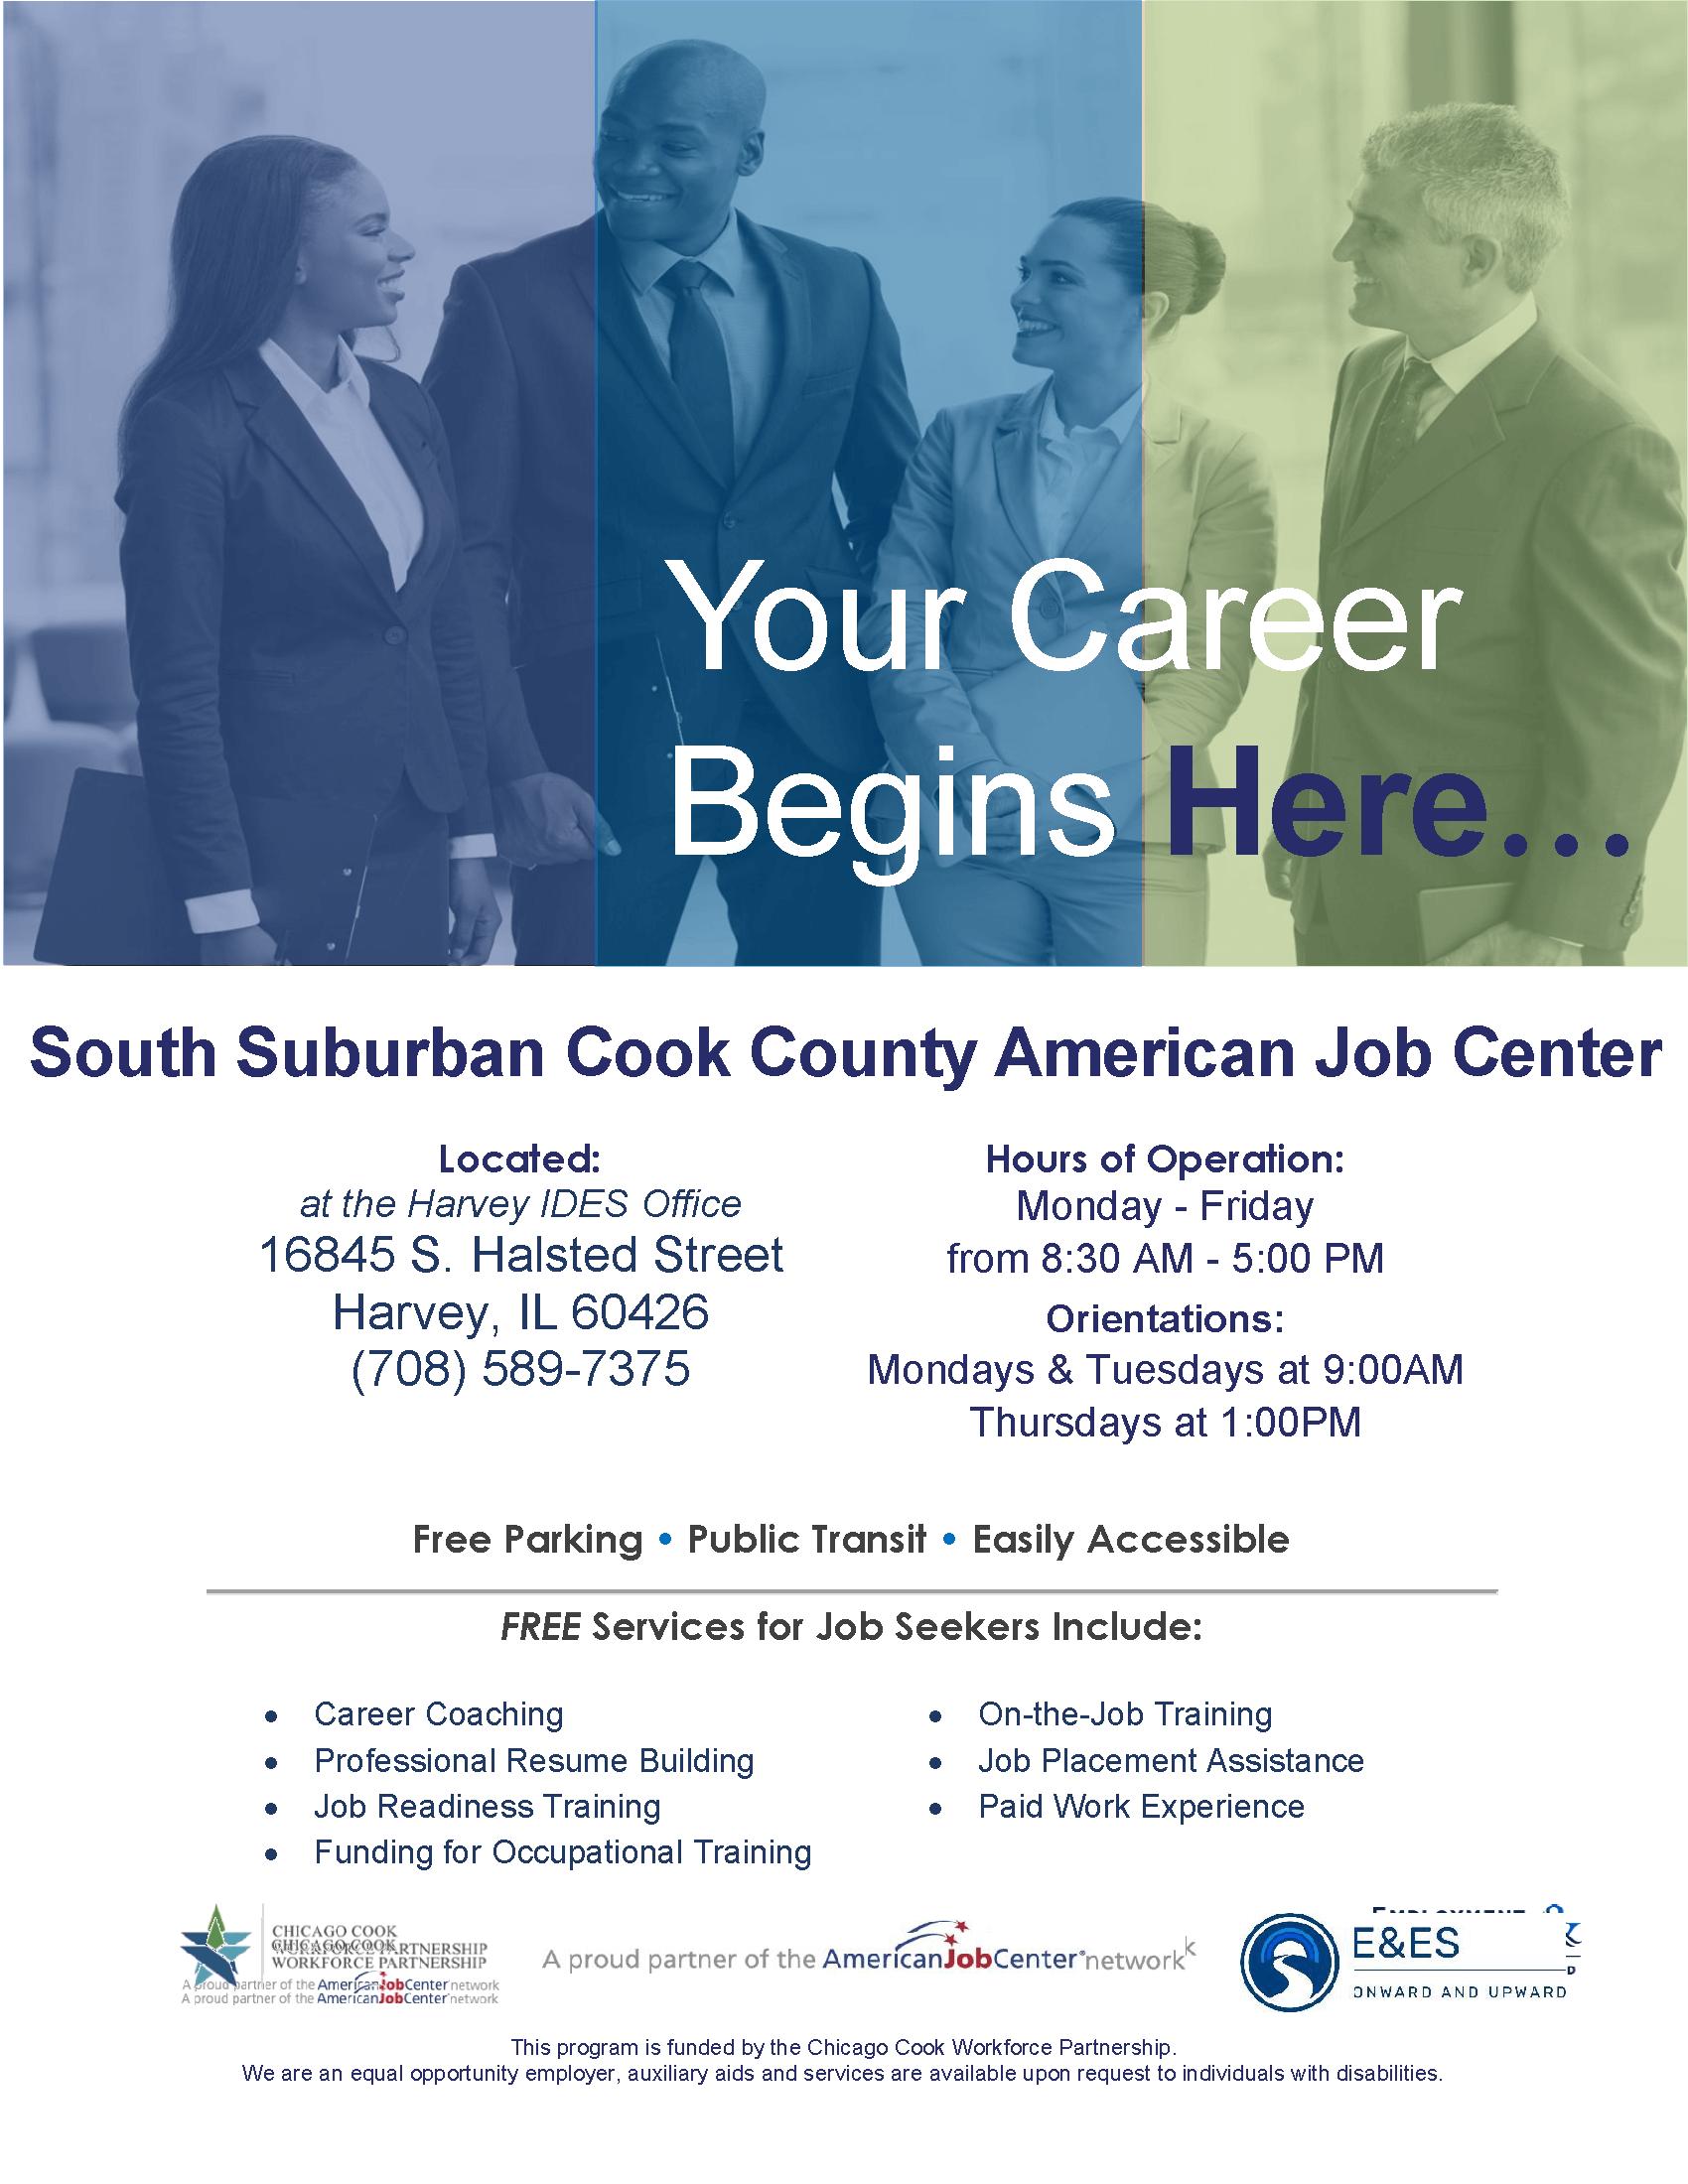 Custom American Job Center flyer at South Suburban